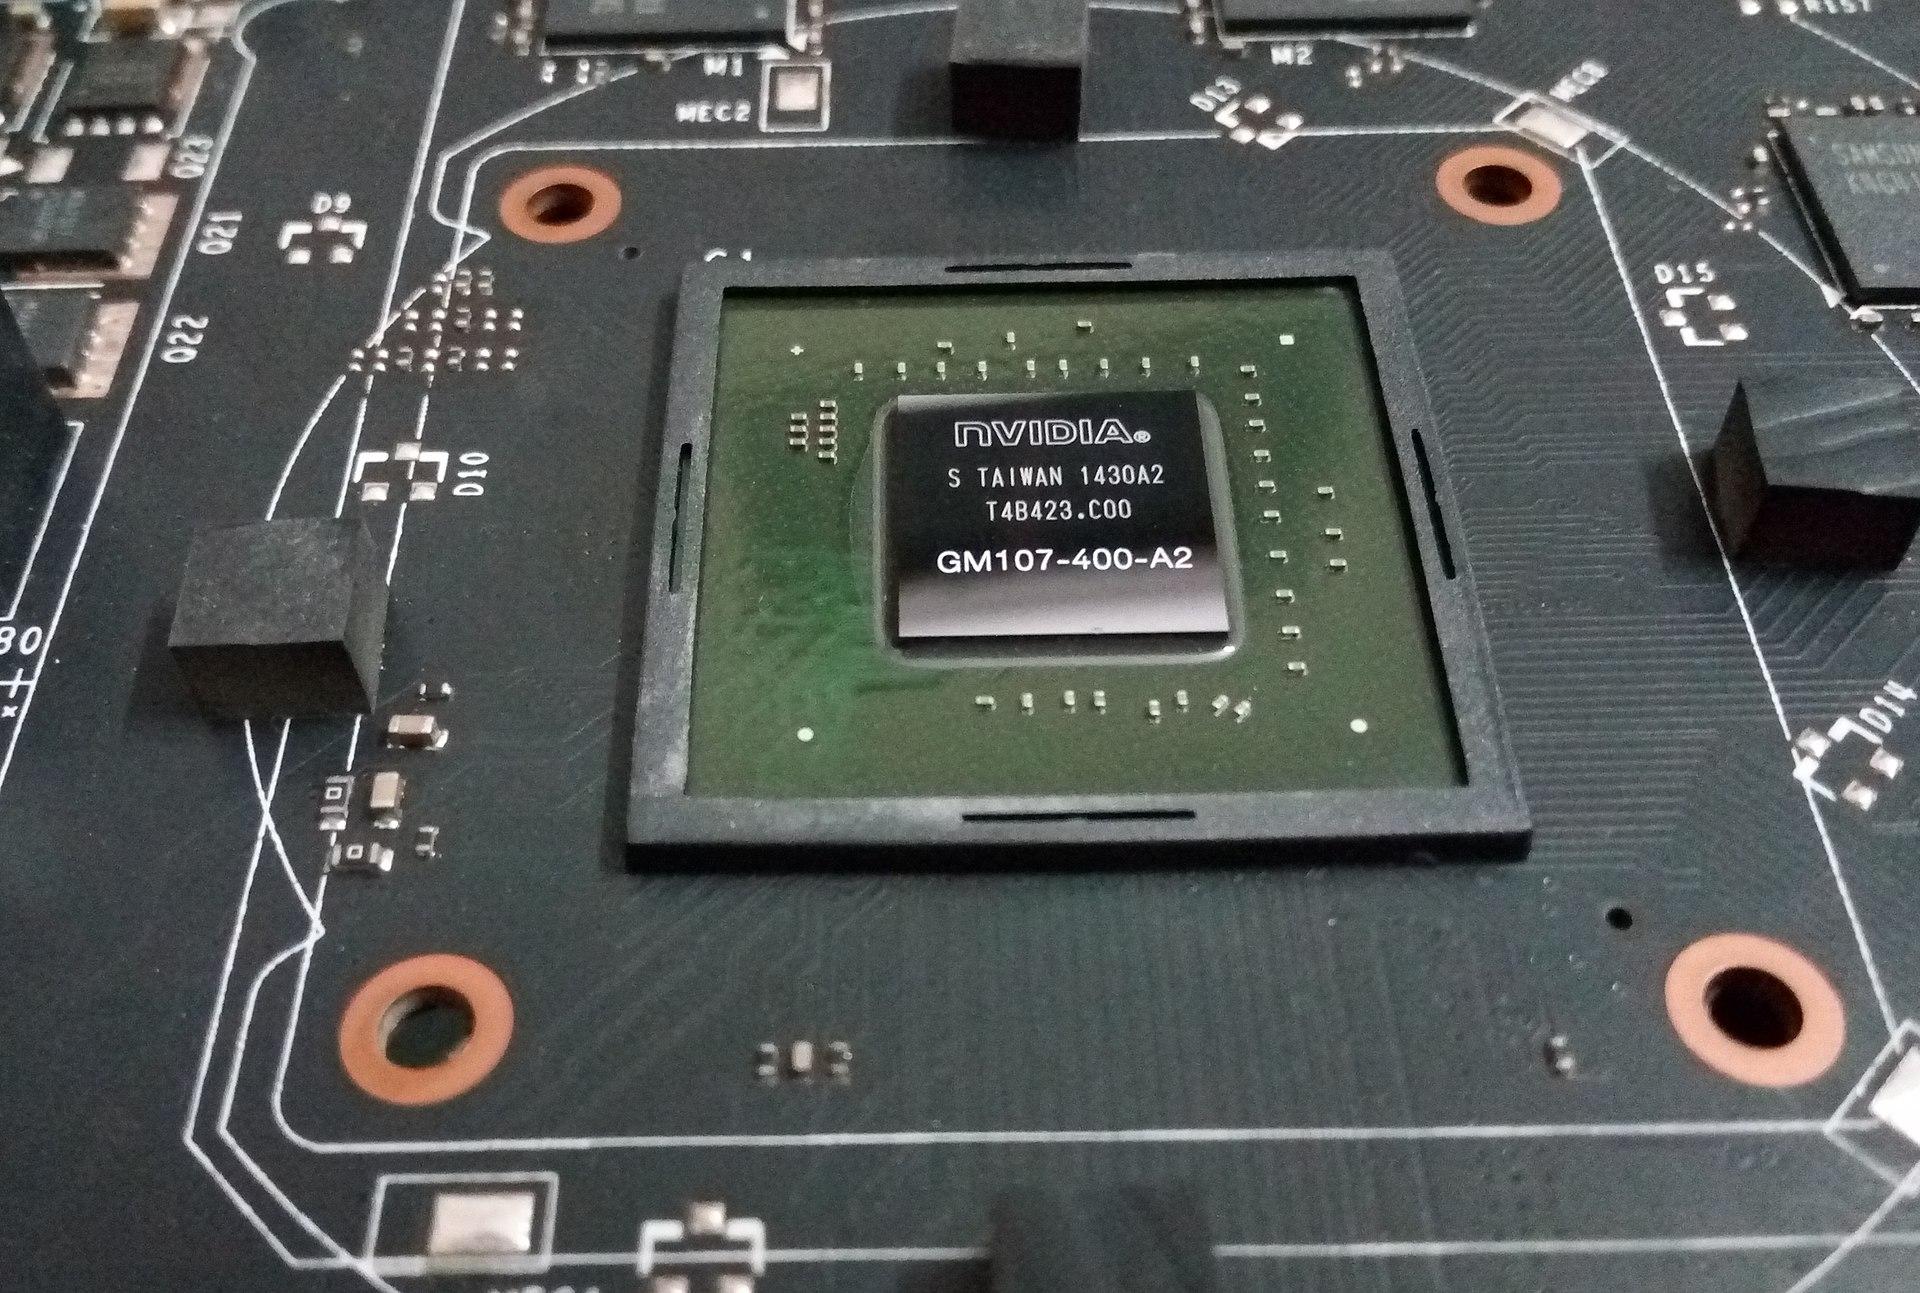 Minar criptomonedas AMD Nvidia